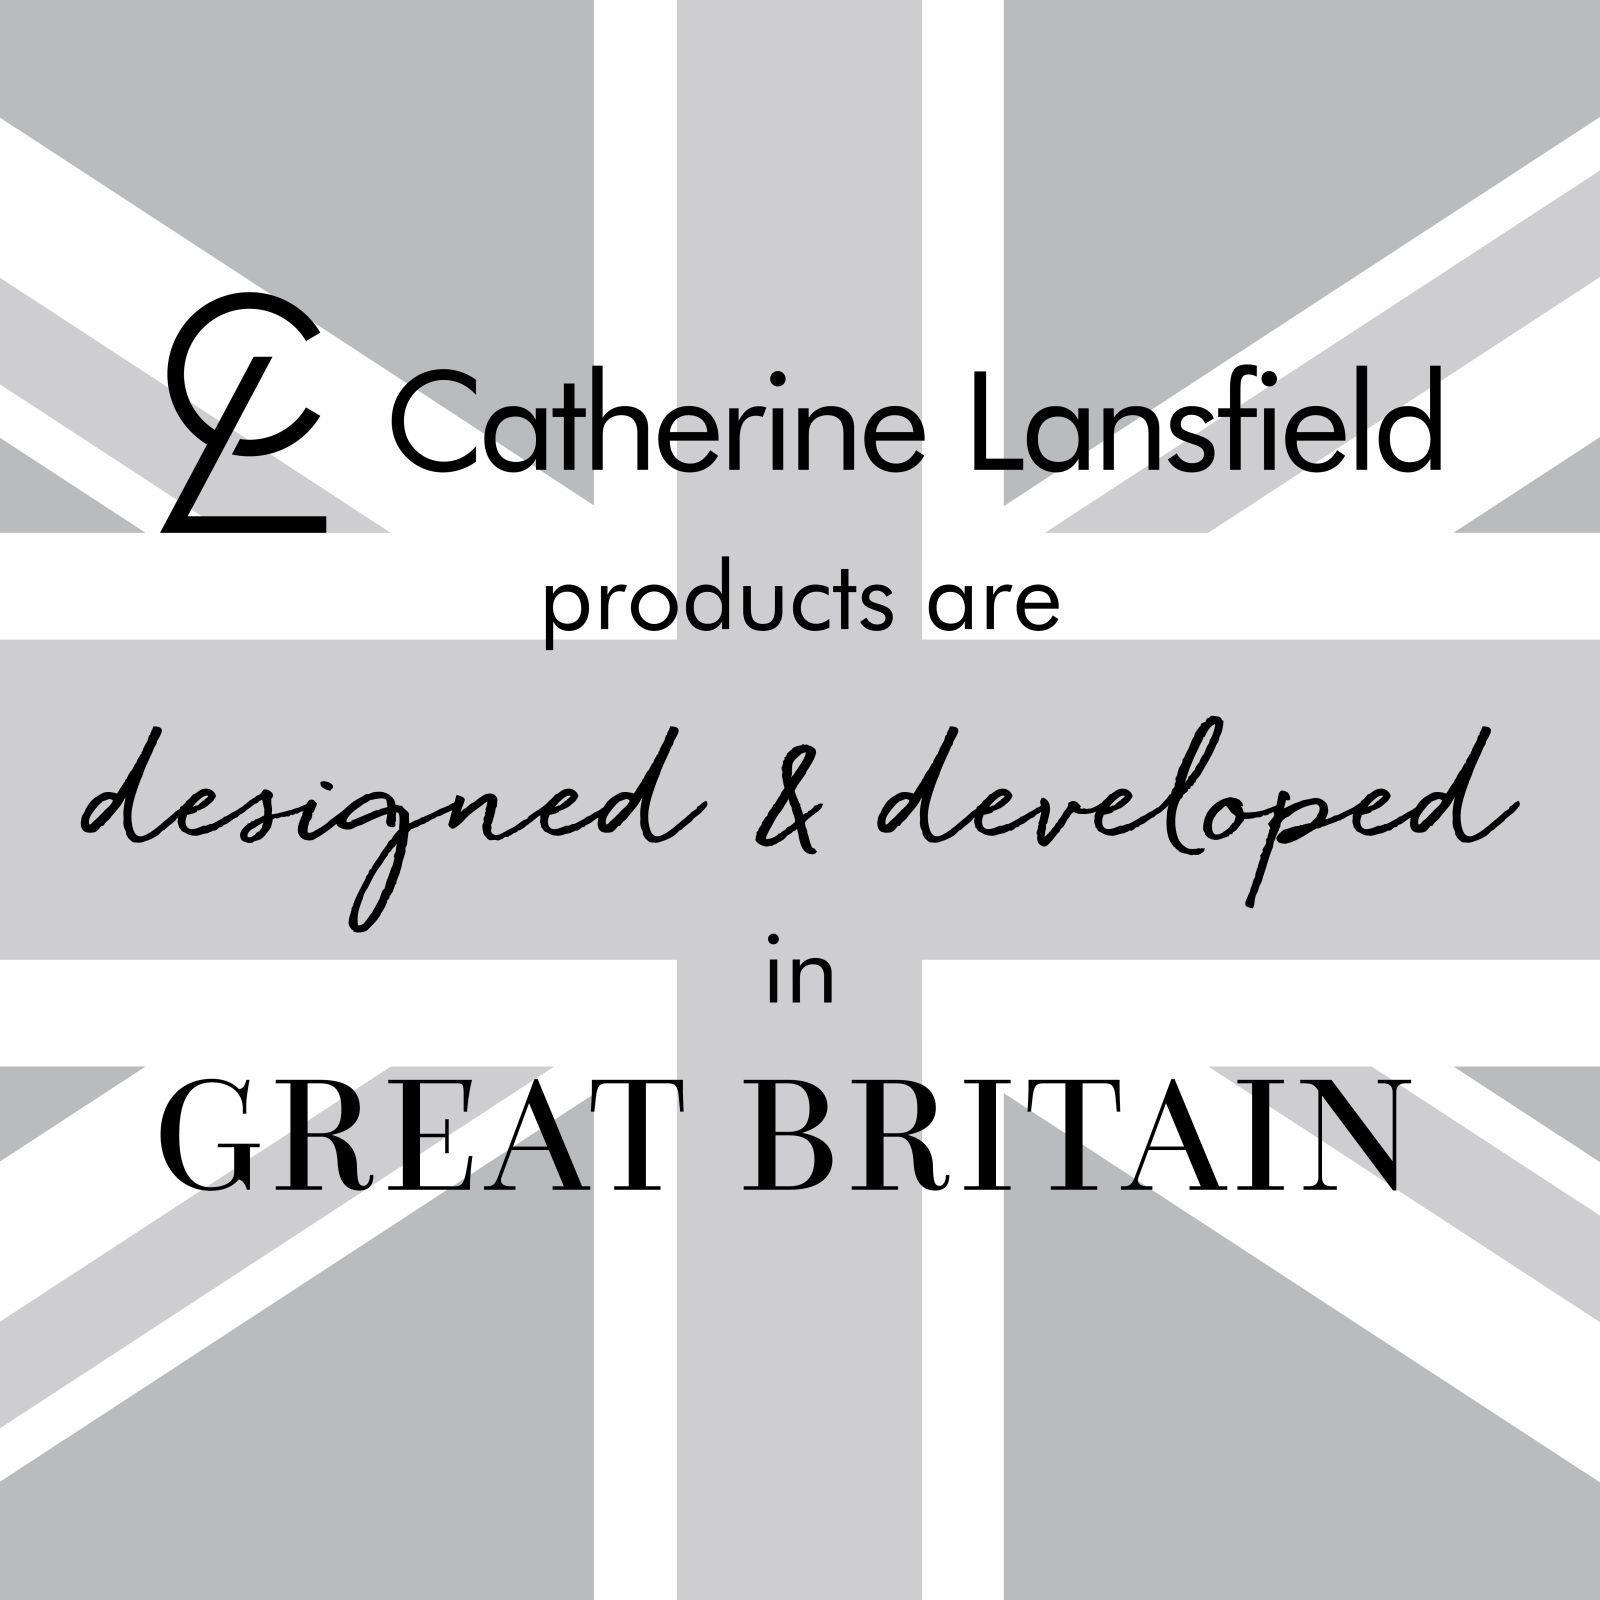 Catherine-Lansfield-Salisbury-Pink-cubierta-del-edredon-edredon-cubre-floral-de-conjuntos-de-cama miniatura 6